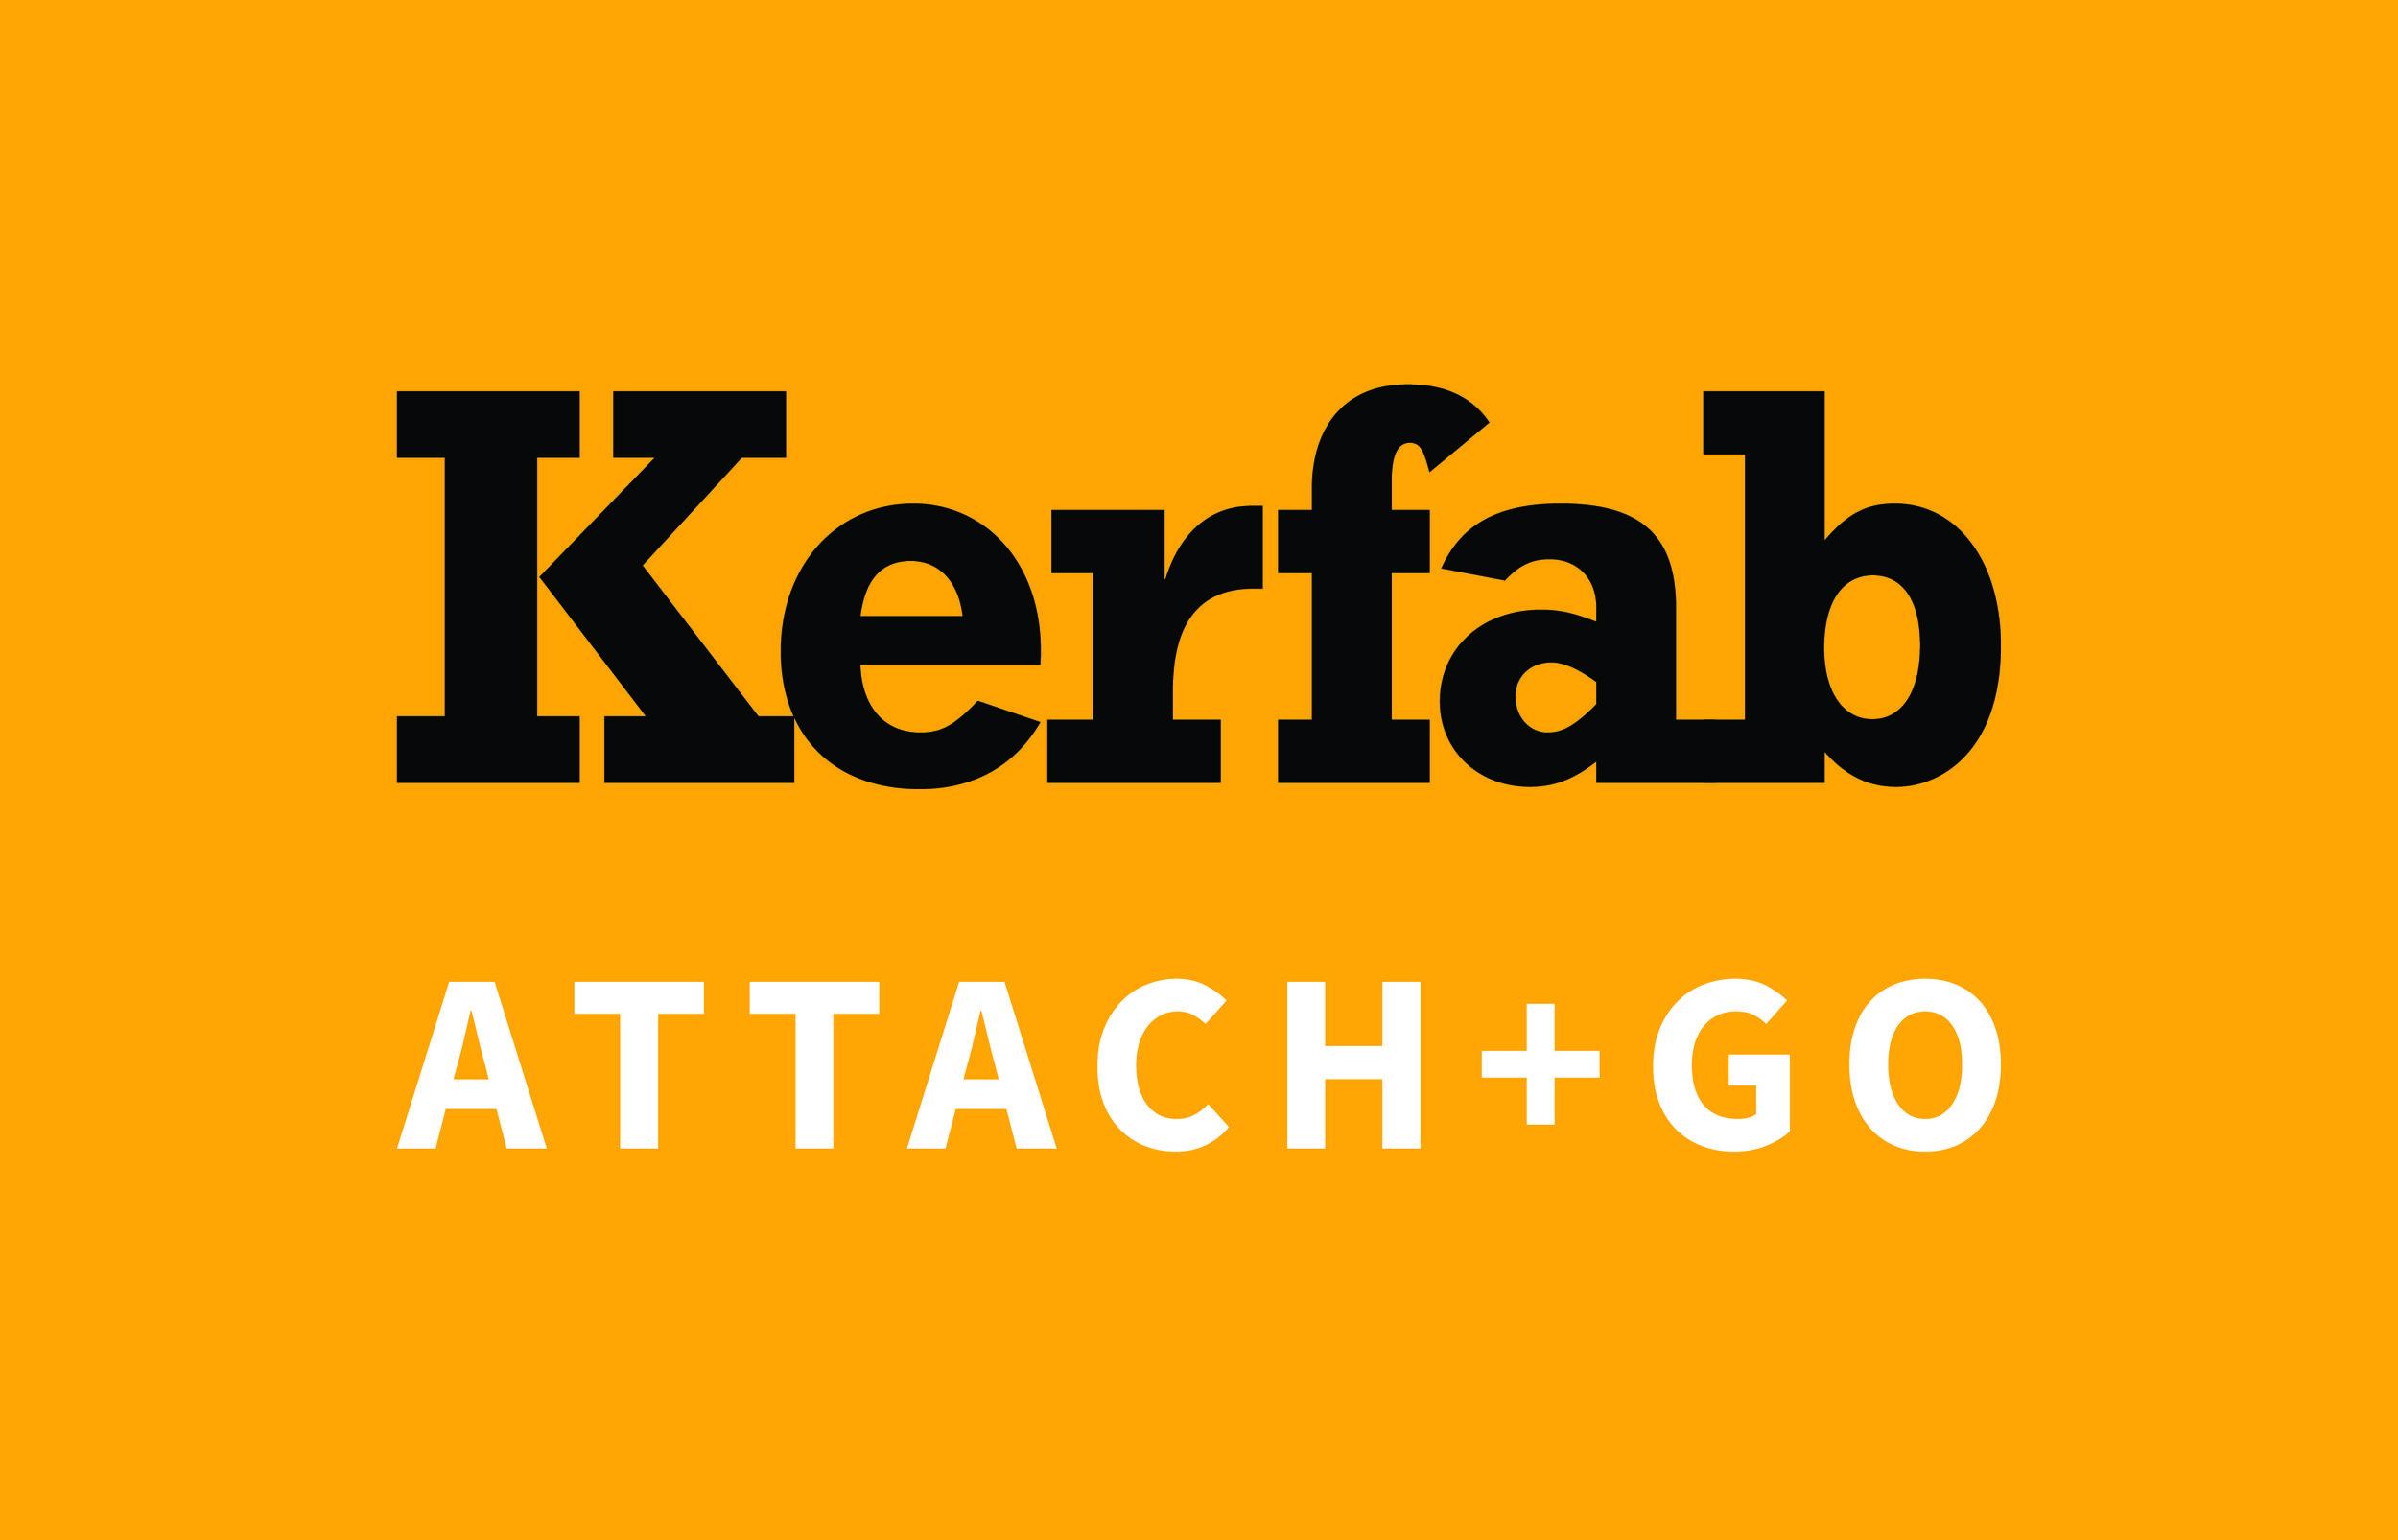 http://kerfab.com.au/